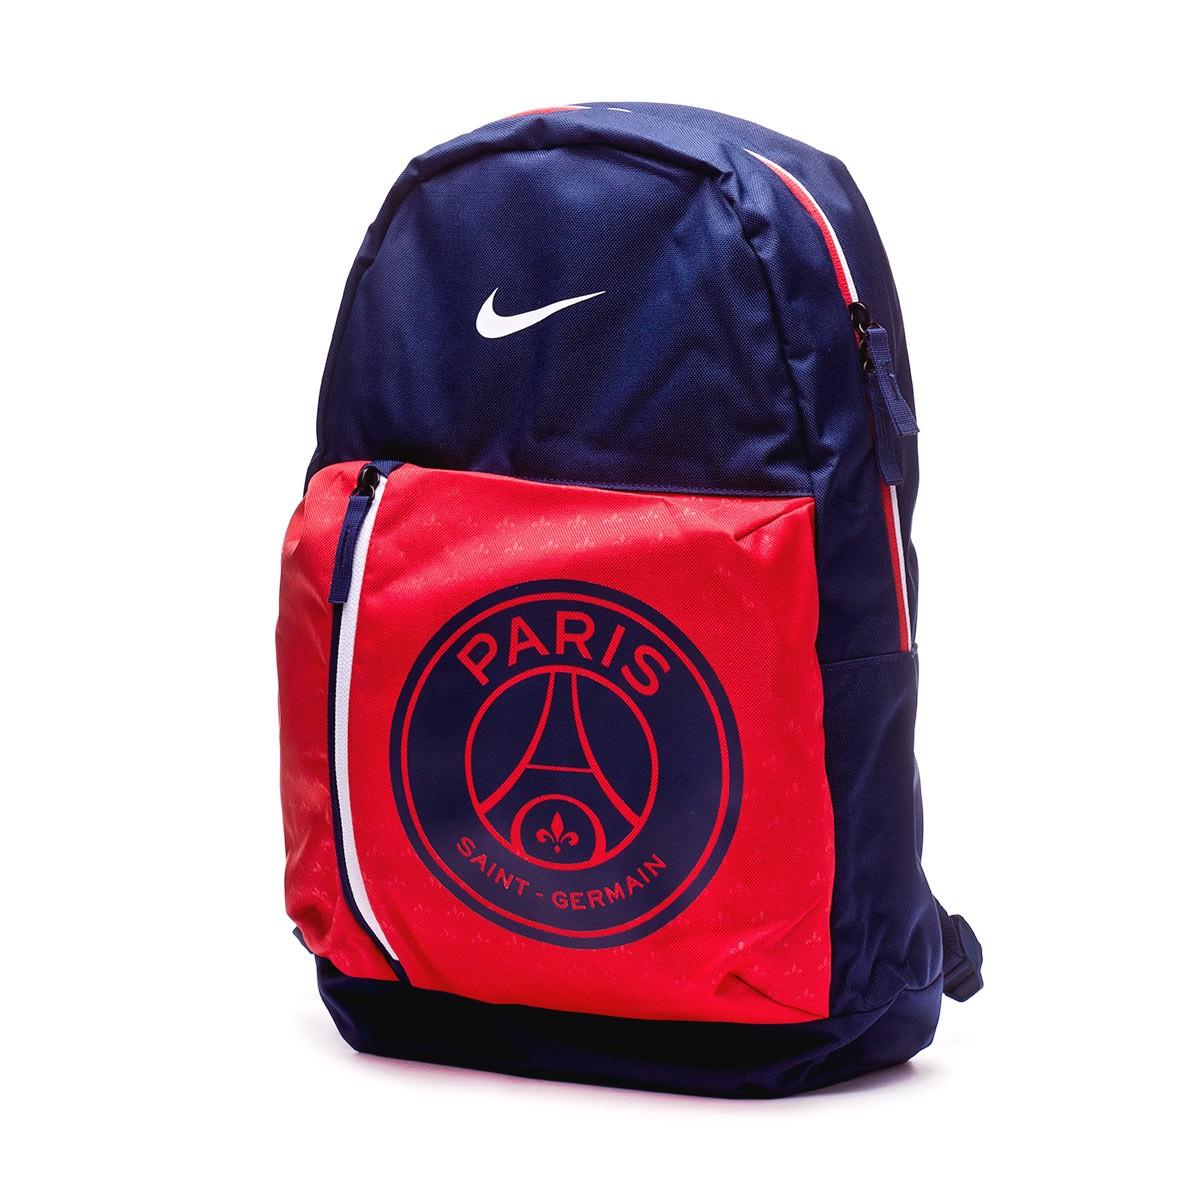 ... Mochila Paris Saint-Germain Stadium 2018-2019 Midnight navy-Challenge  red-White. CATEGORIA 6fead118f1175